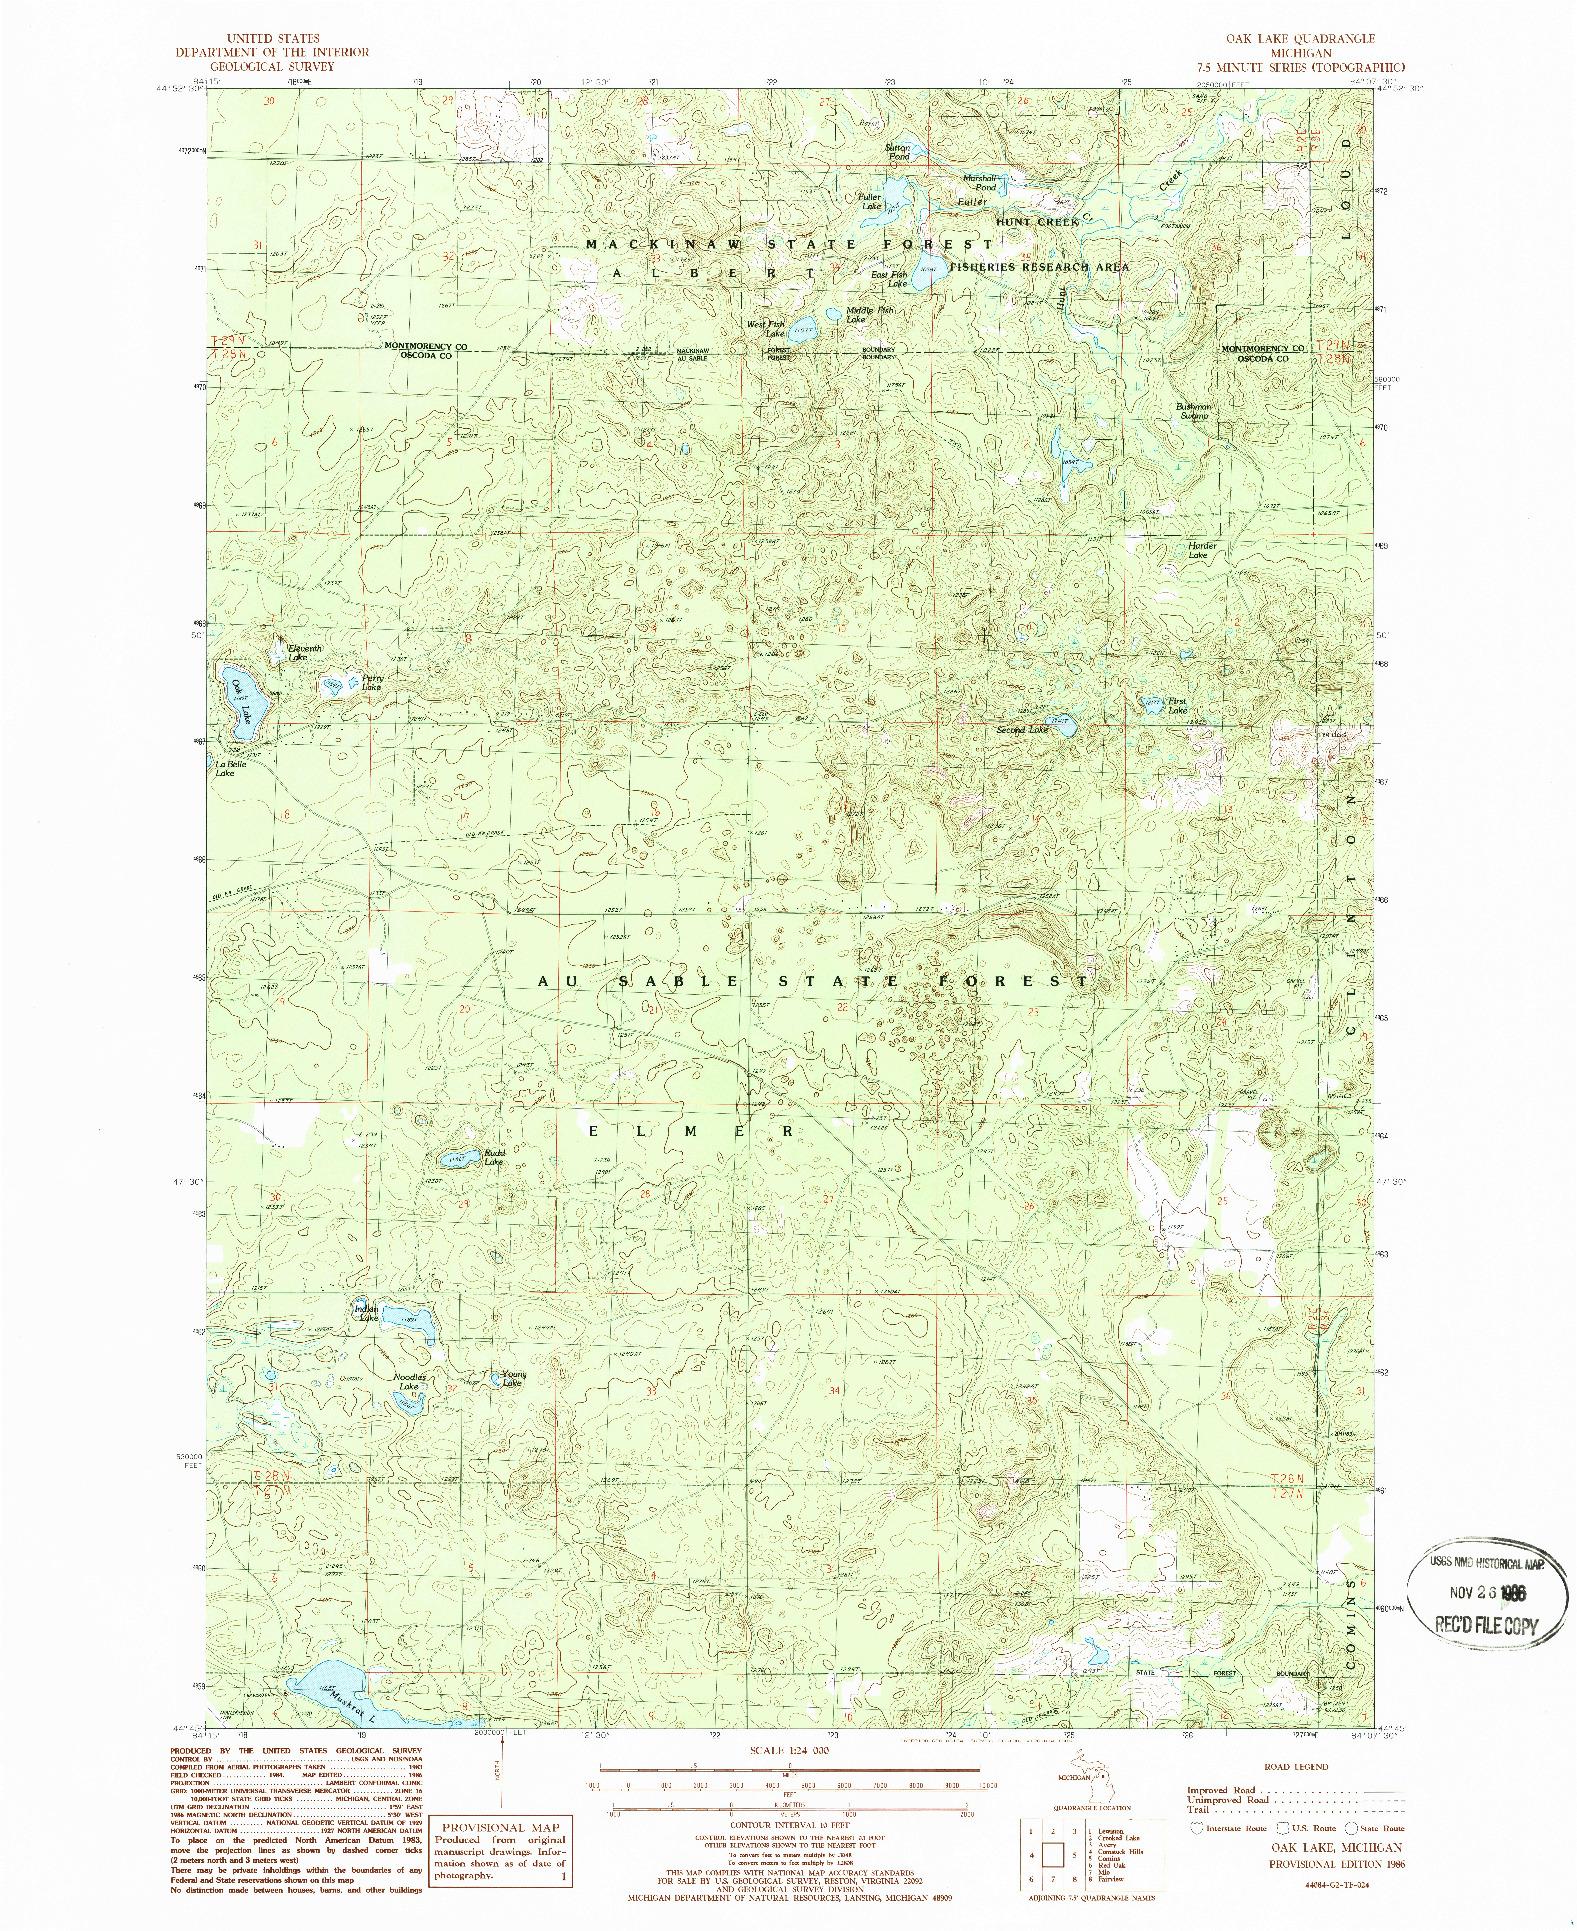 USGS 1:24000-SCALE QUADRANGLE FOR OAK LAKE, MI 1986